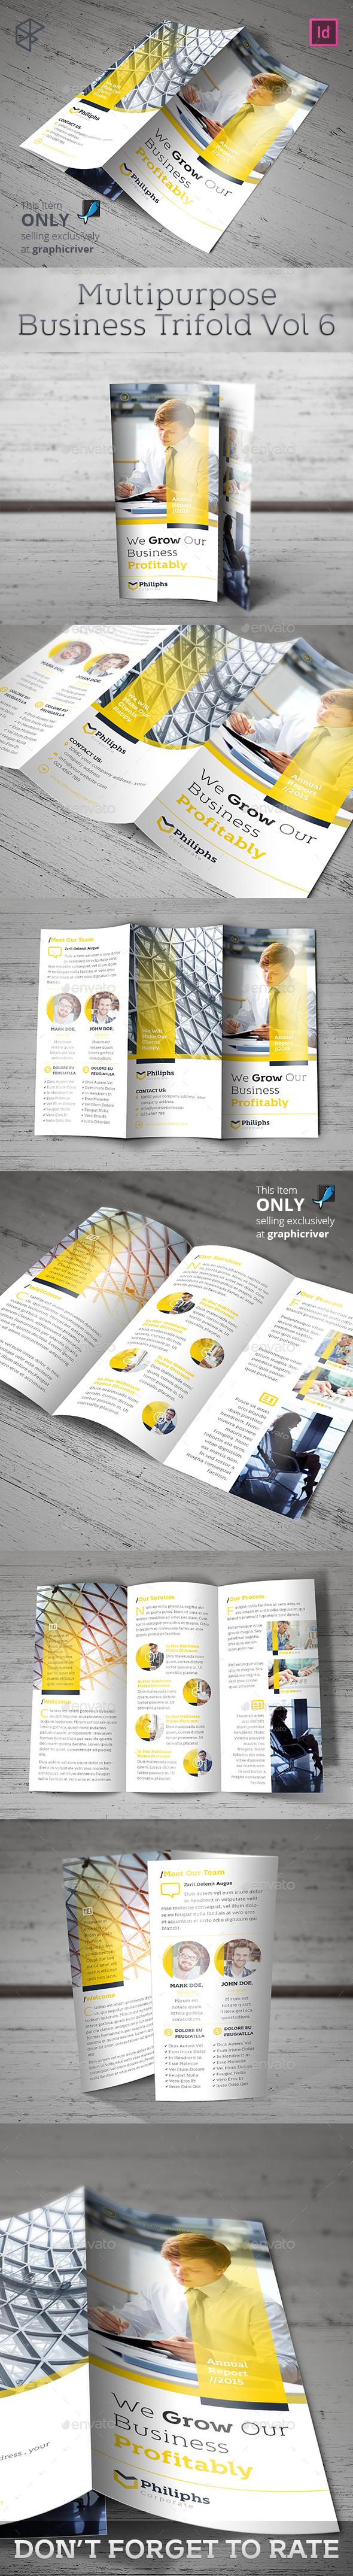 Multipurpose Business Trifold Vol 6 - Corporate Brochures